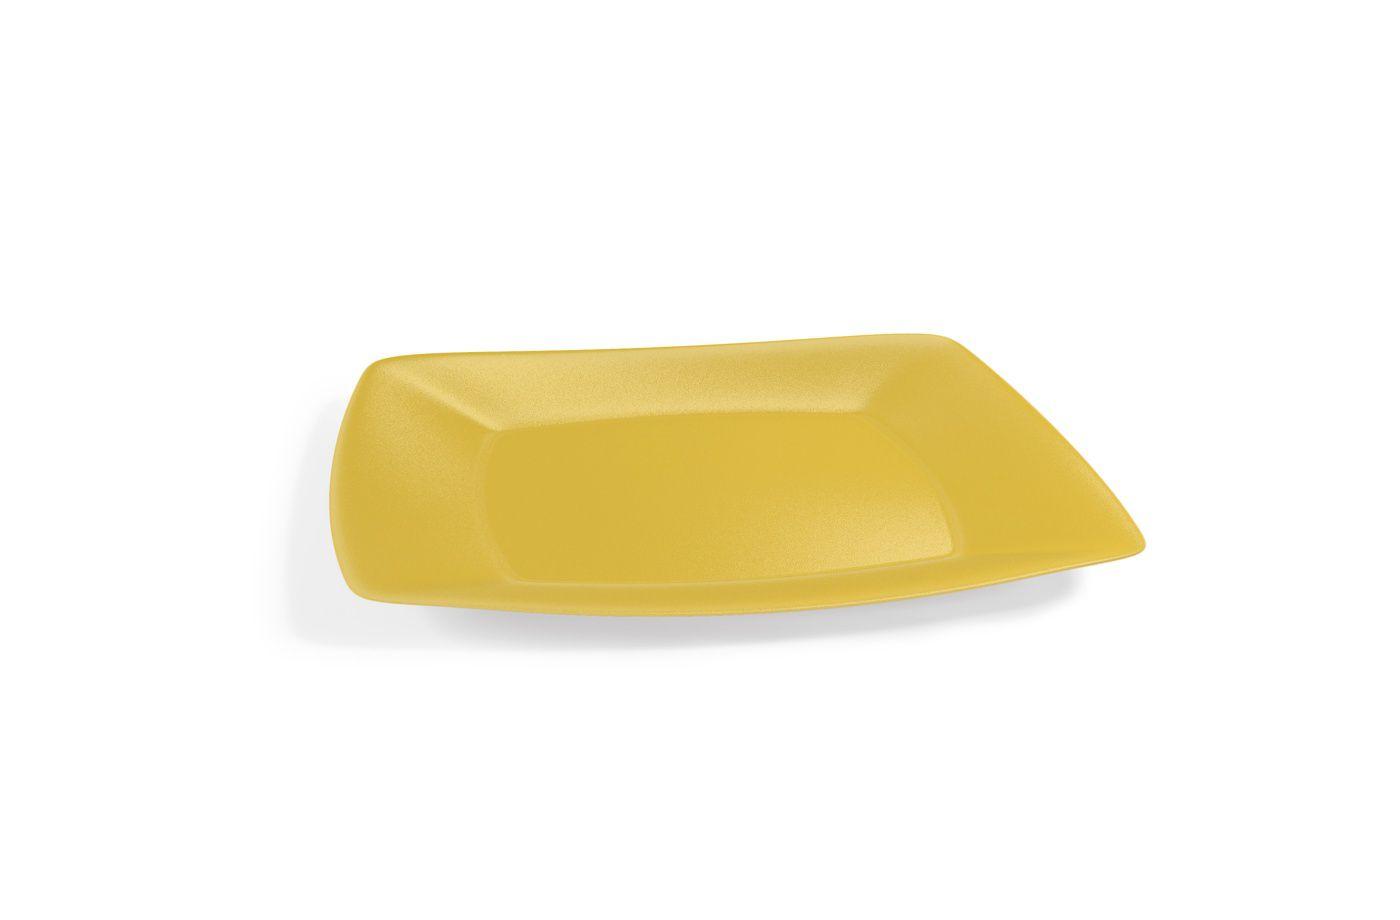 Prato Lanche Plástico Quadrado M 22,5 cm Amarelo